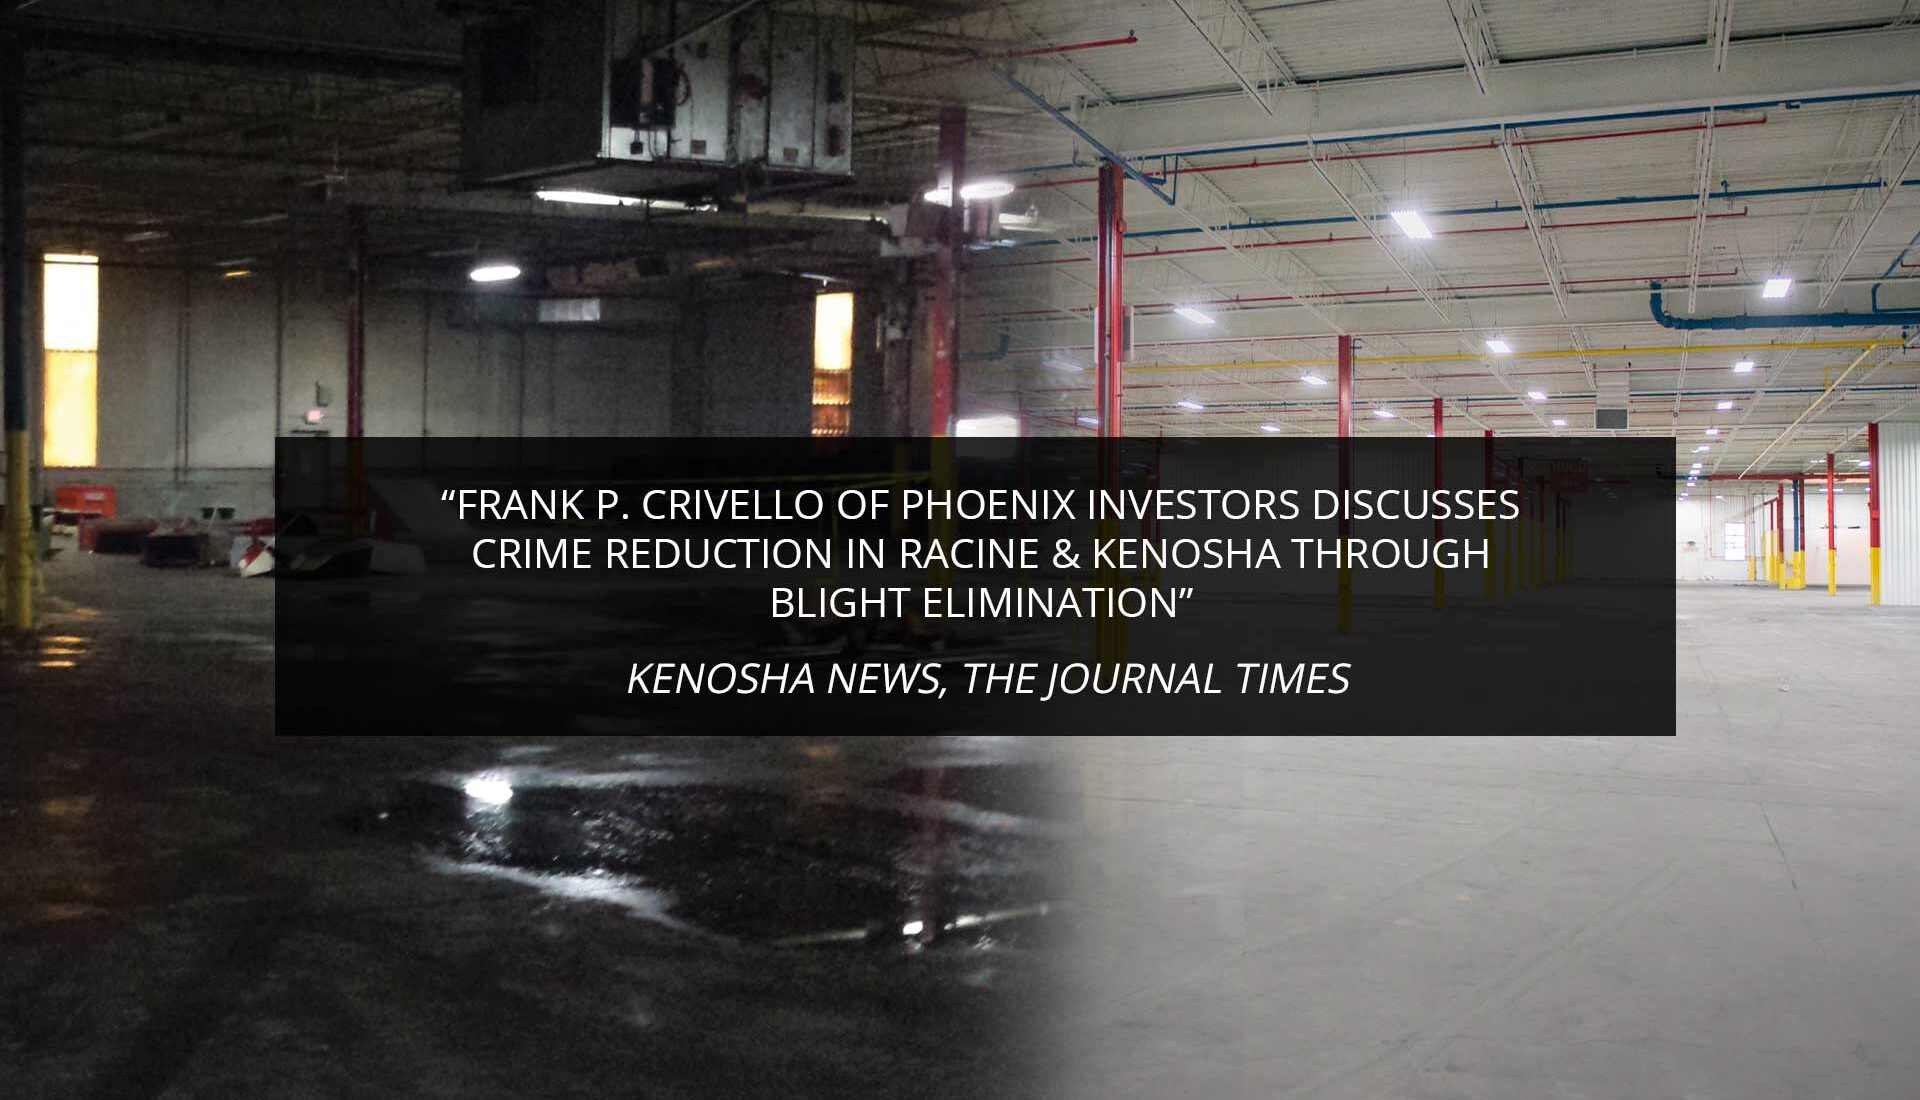 Frank P. Crivello of Phoenix Investors discusses crime reduction in Racine & Kenosha through blight elimination